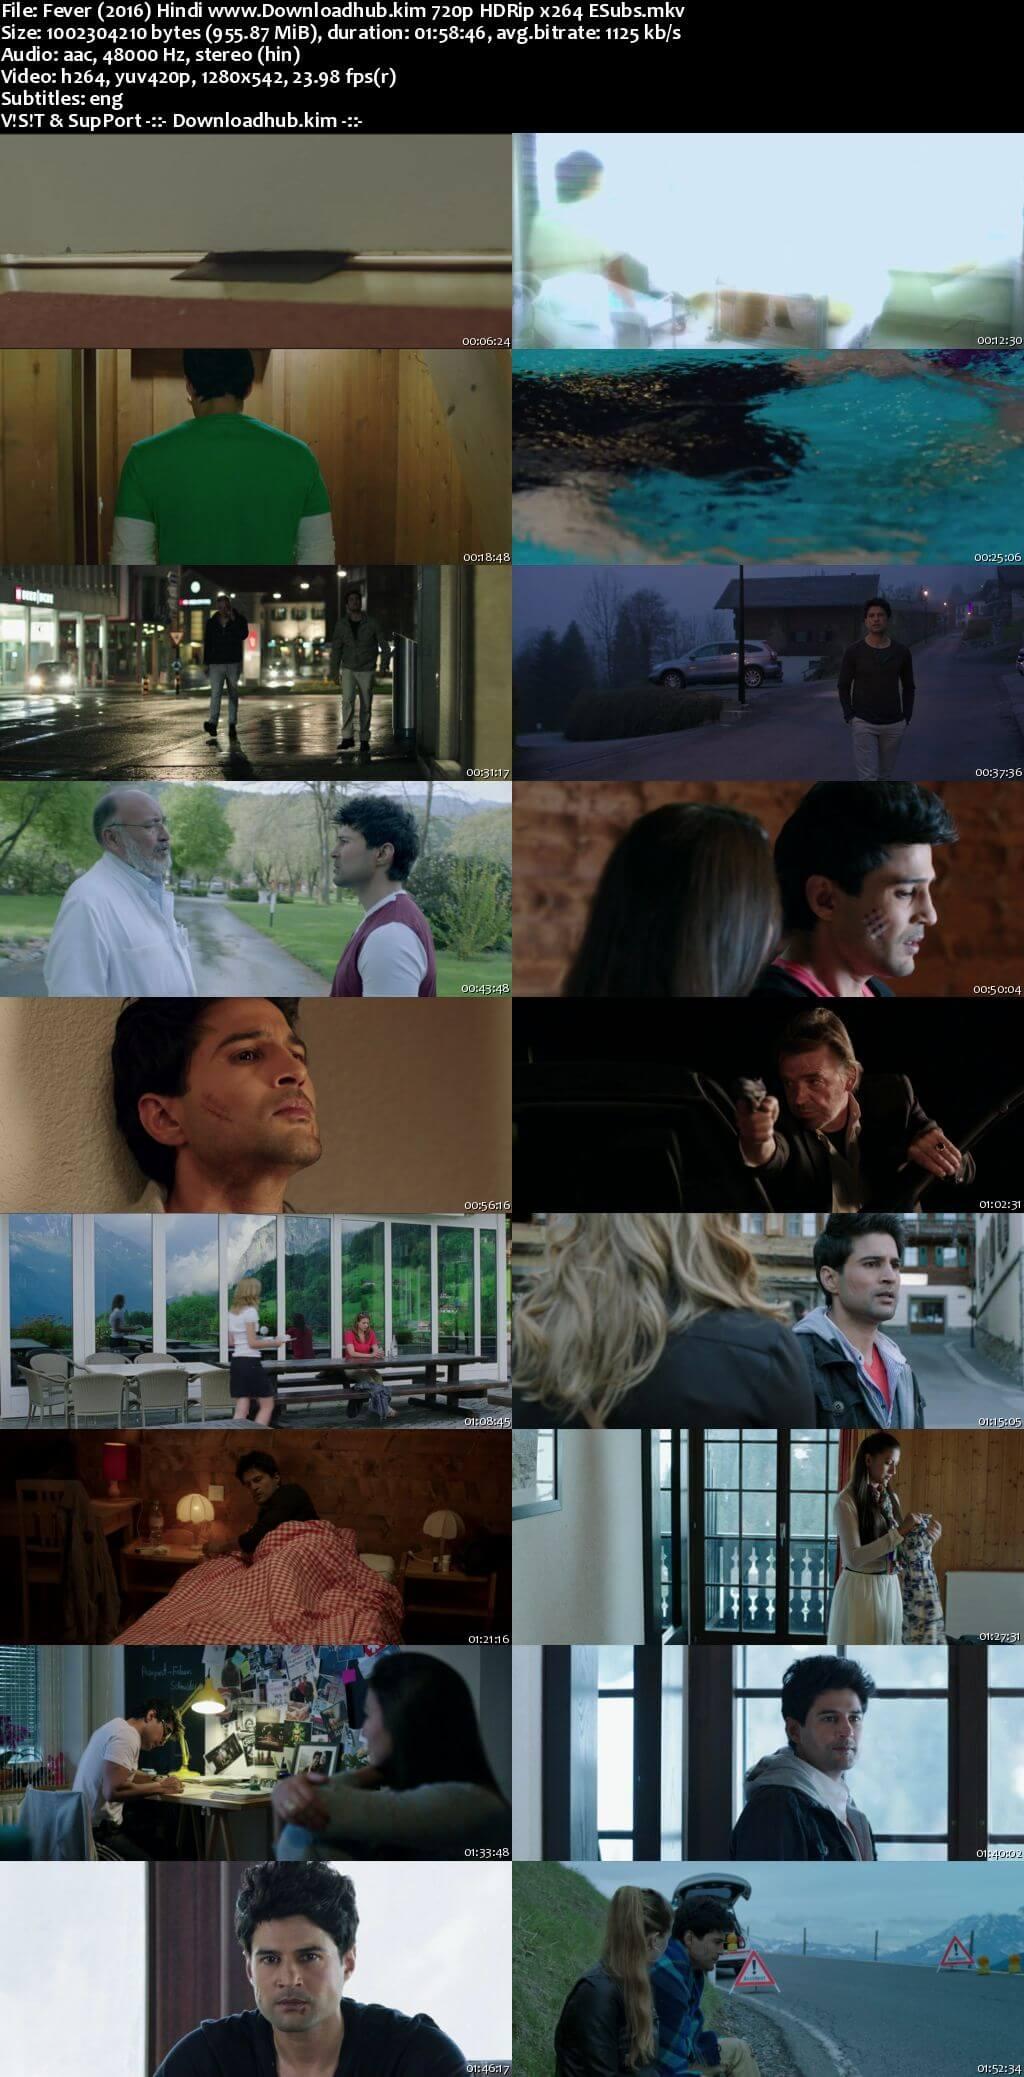 Fever 2016 Hindi 720p HDRip ESubs